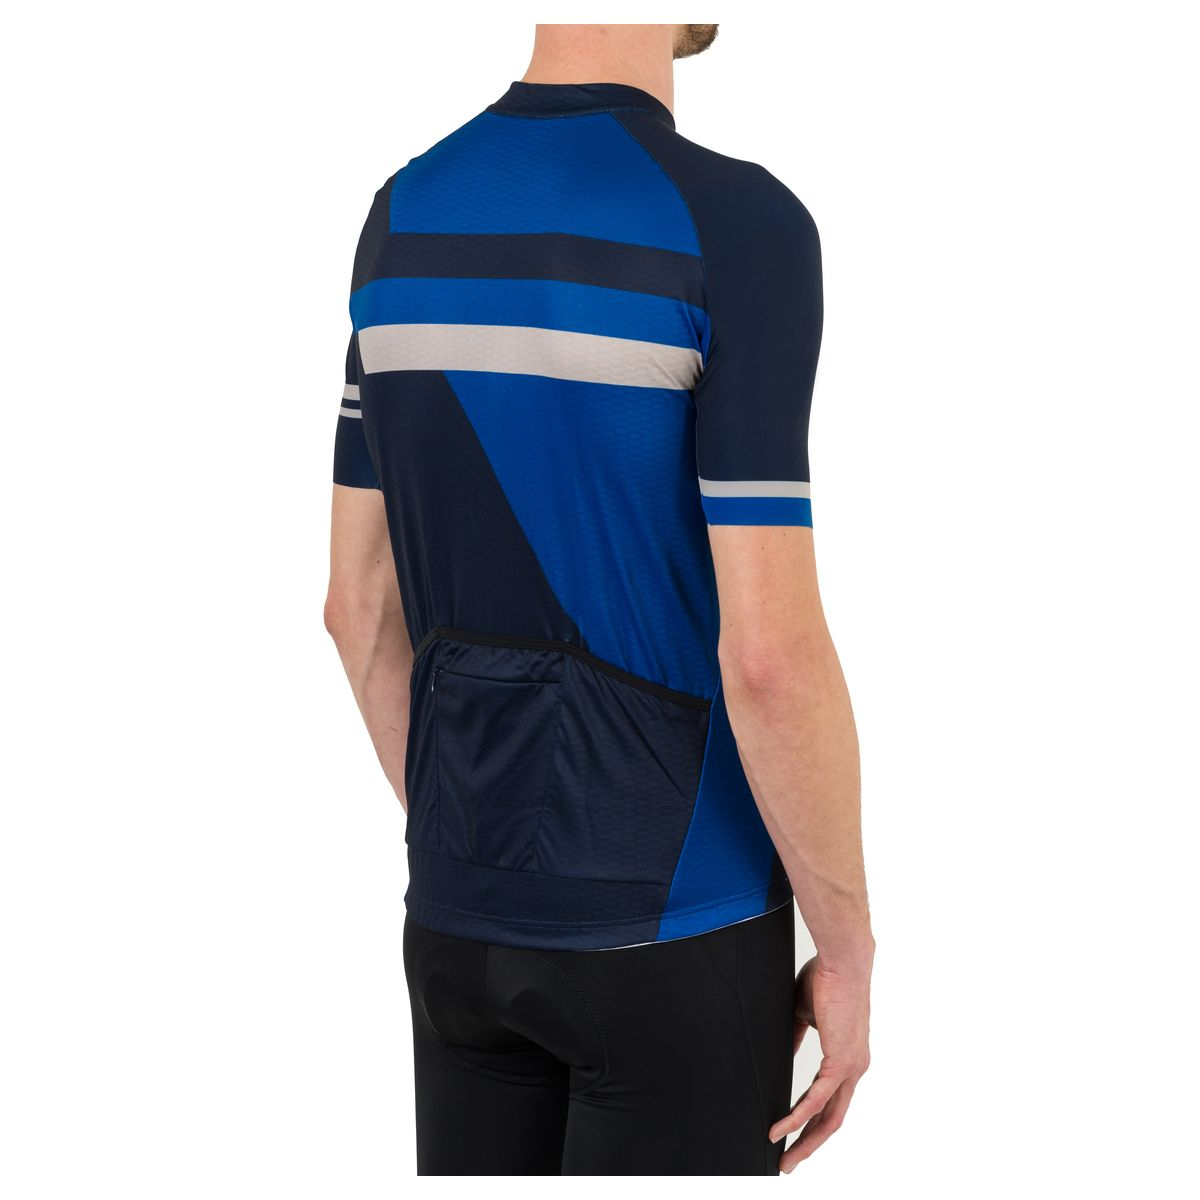 Inception Fietsshirt Essential Heren fit example